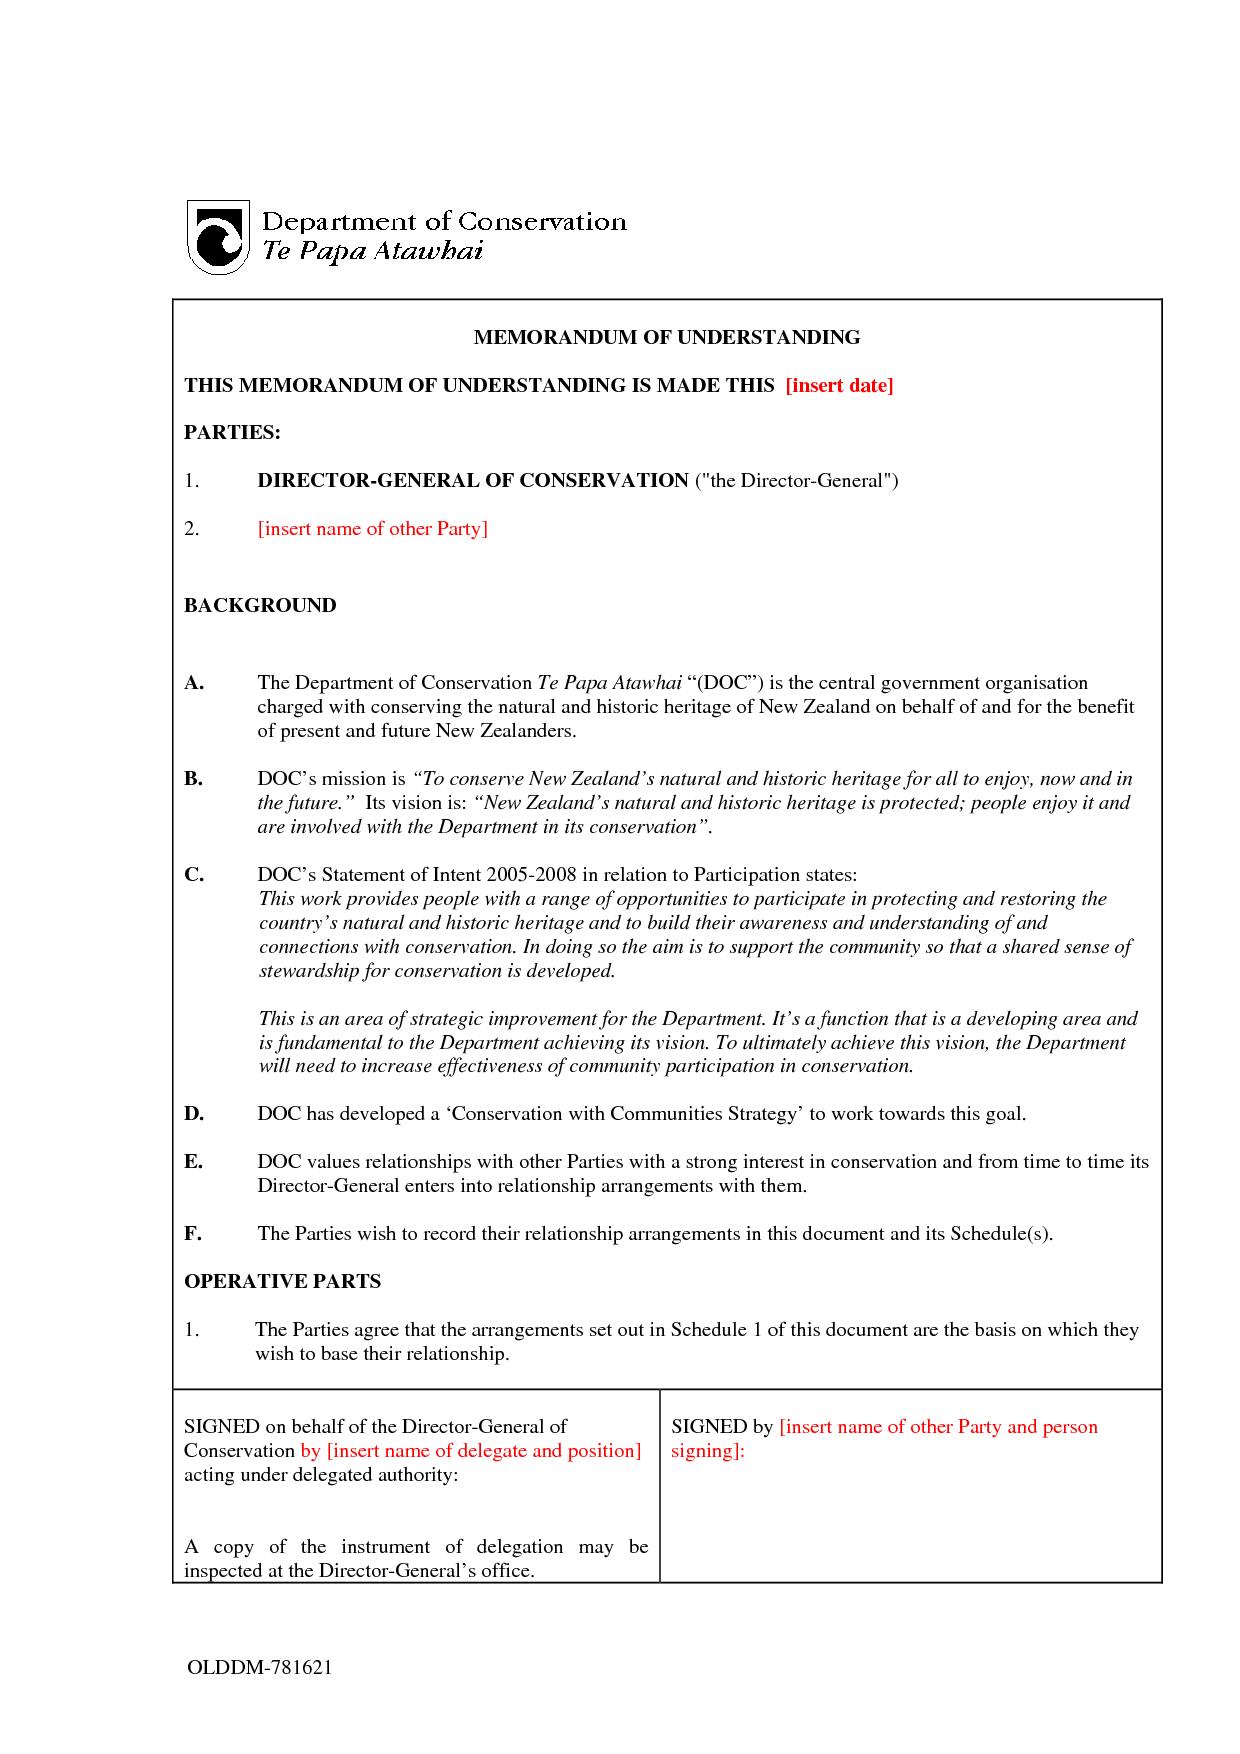 Memorandum Of Understanding Sample Free Printable Documents Memorandum Memo Template Business Letter Example